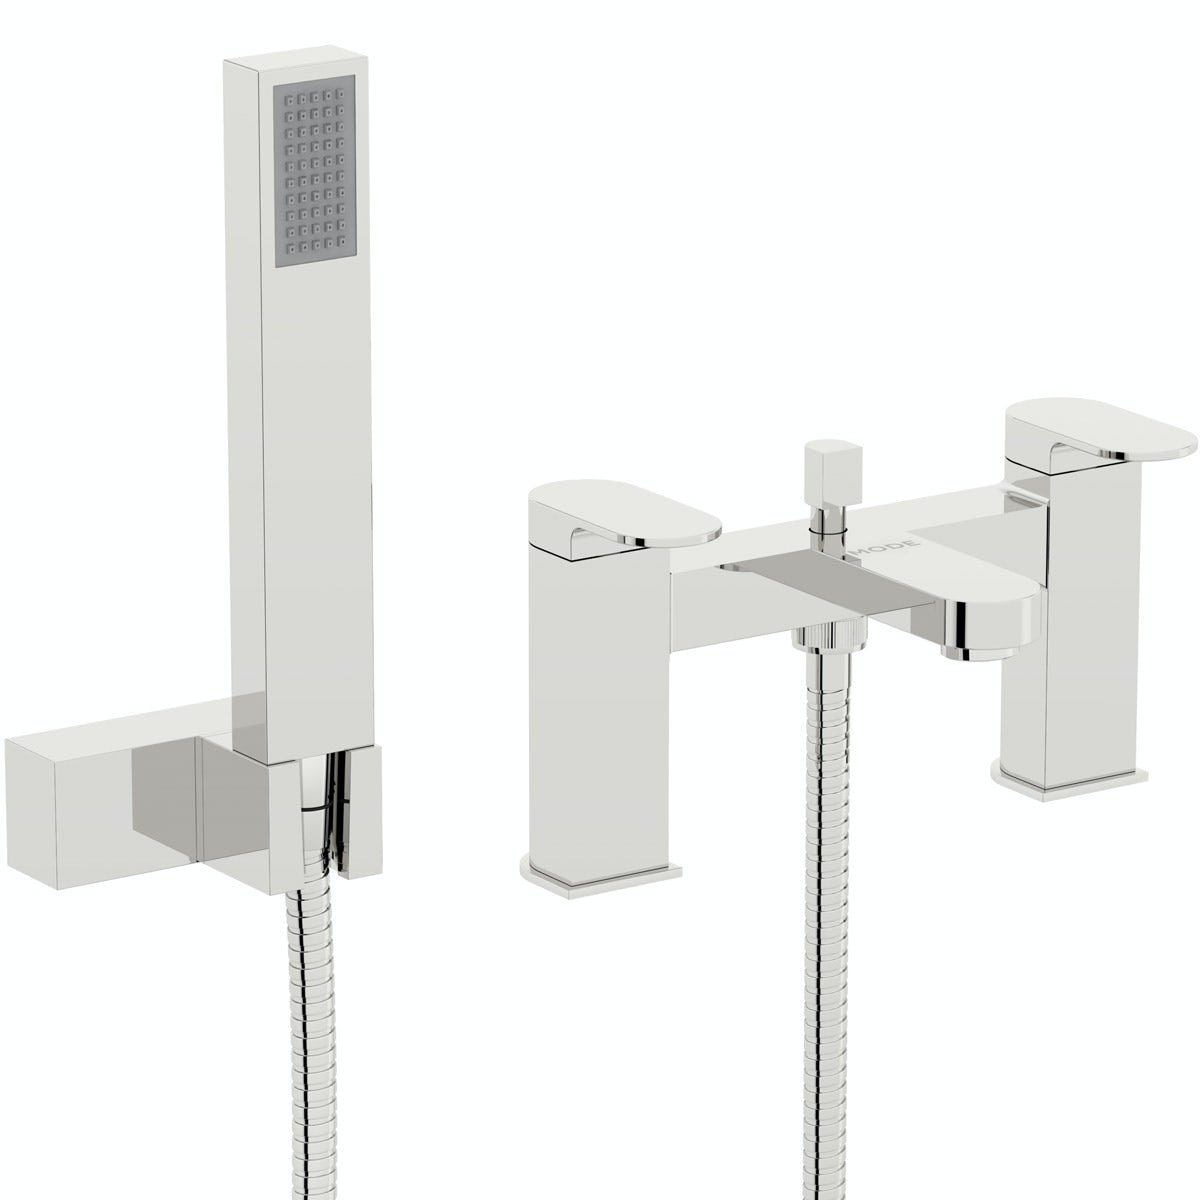 Mode Hardy bath shower mixer tap